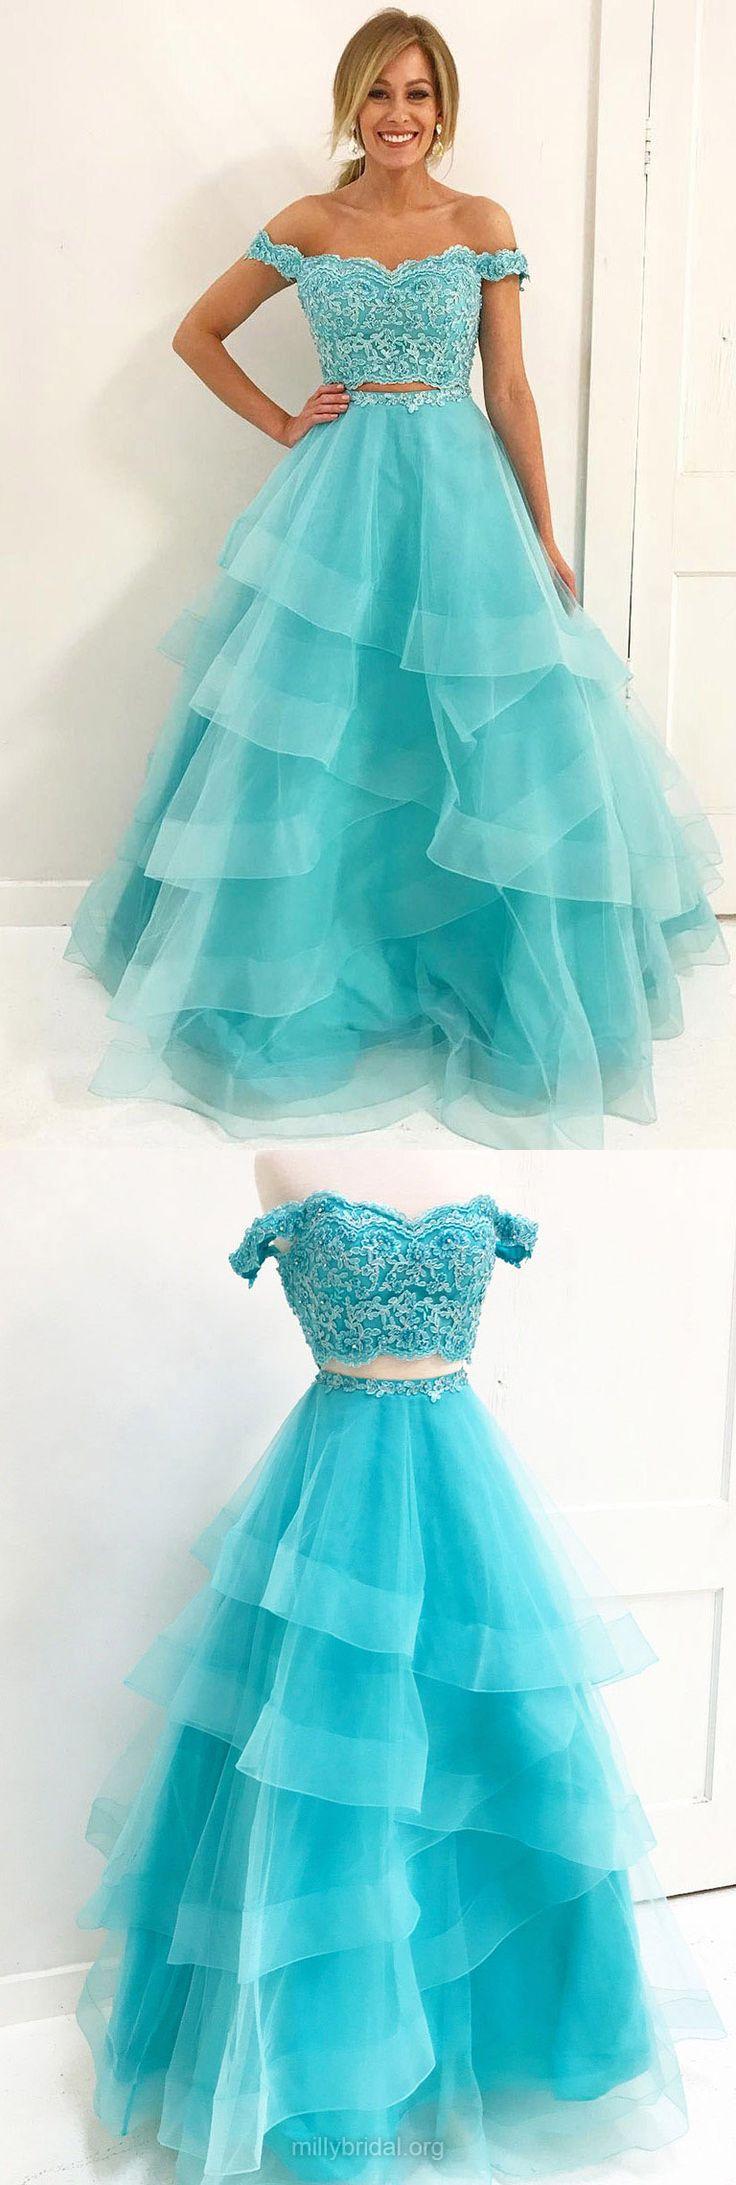 4508 best Dresses images on Pinterest | Evening gowns, Formal ...